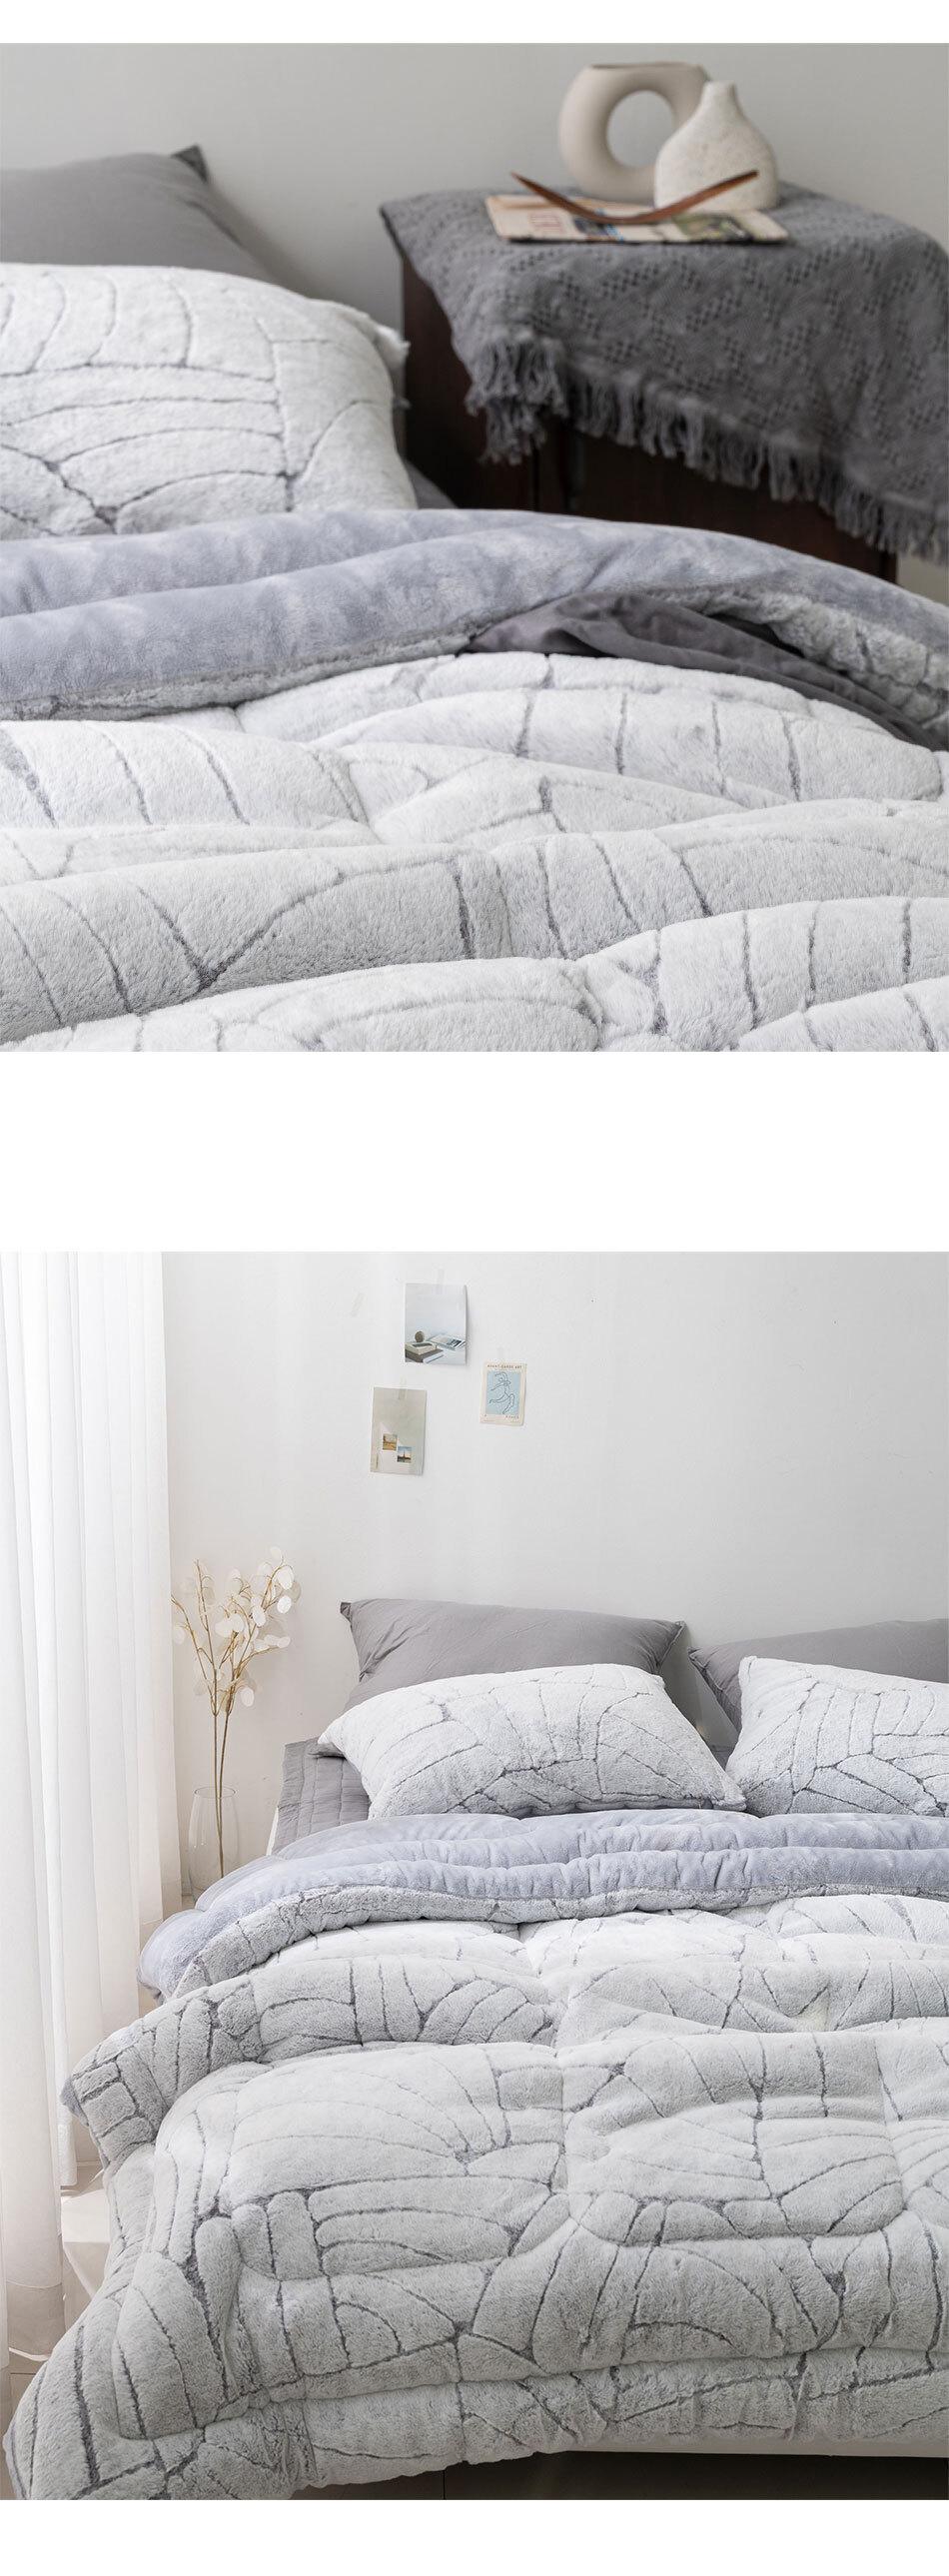 maple_bed_gray_02.jpg